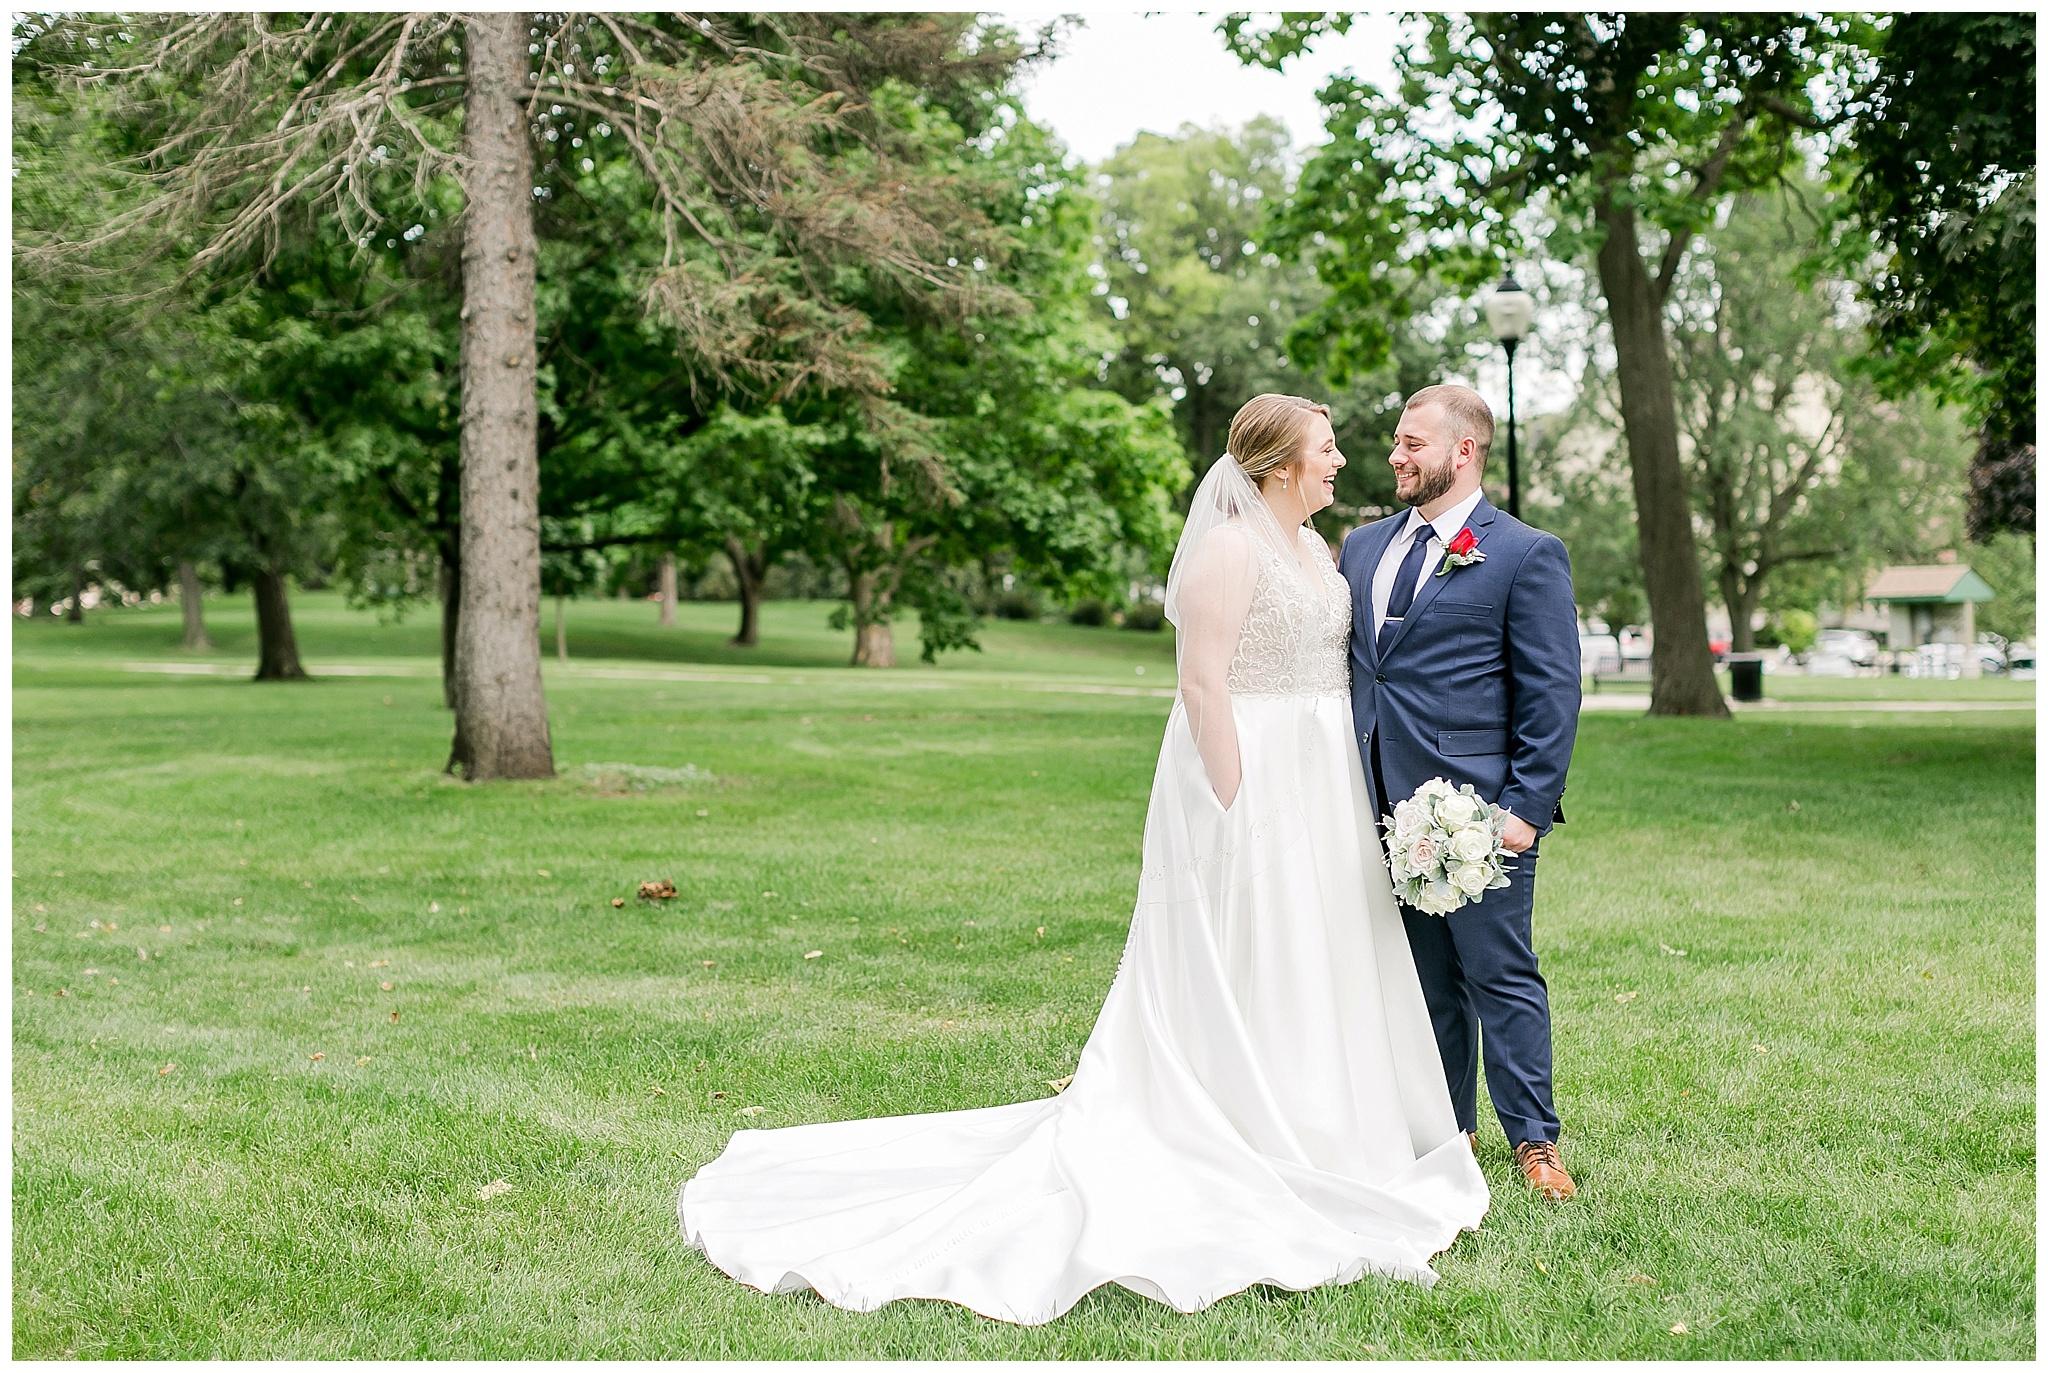 la_casa_grande_wedding_beloit_wisconsin_caynay_photo_0030.jpg